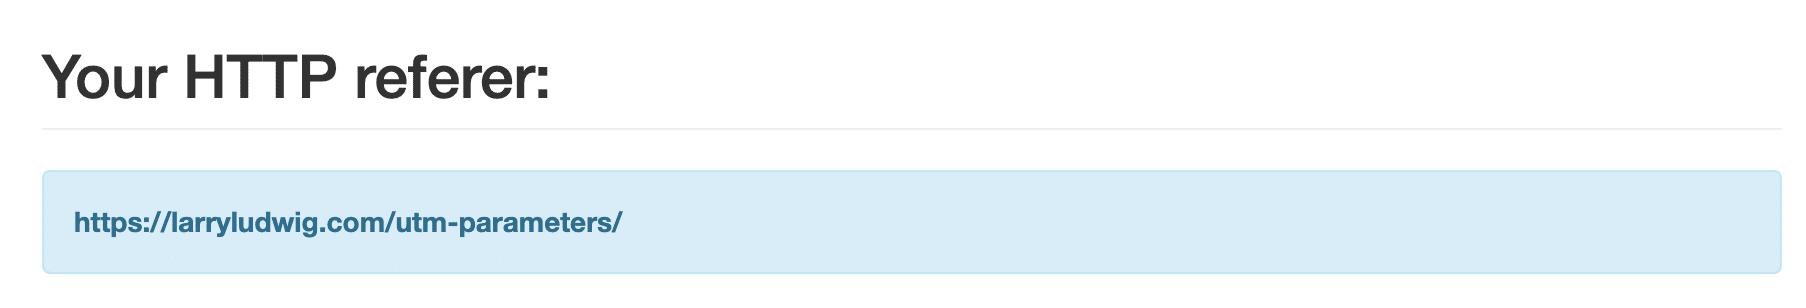 HTTP referer